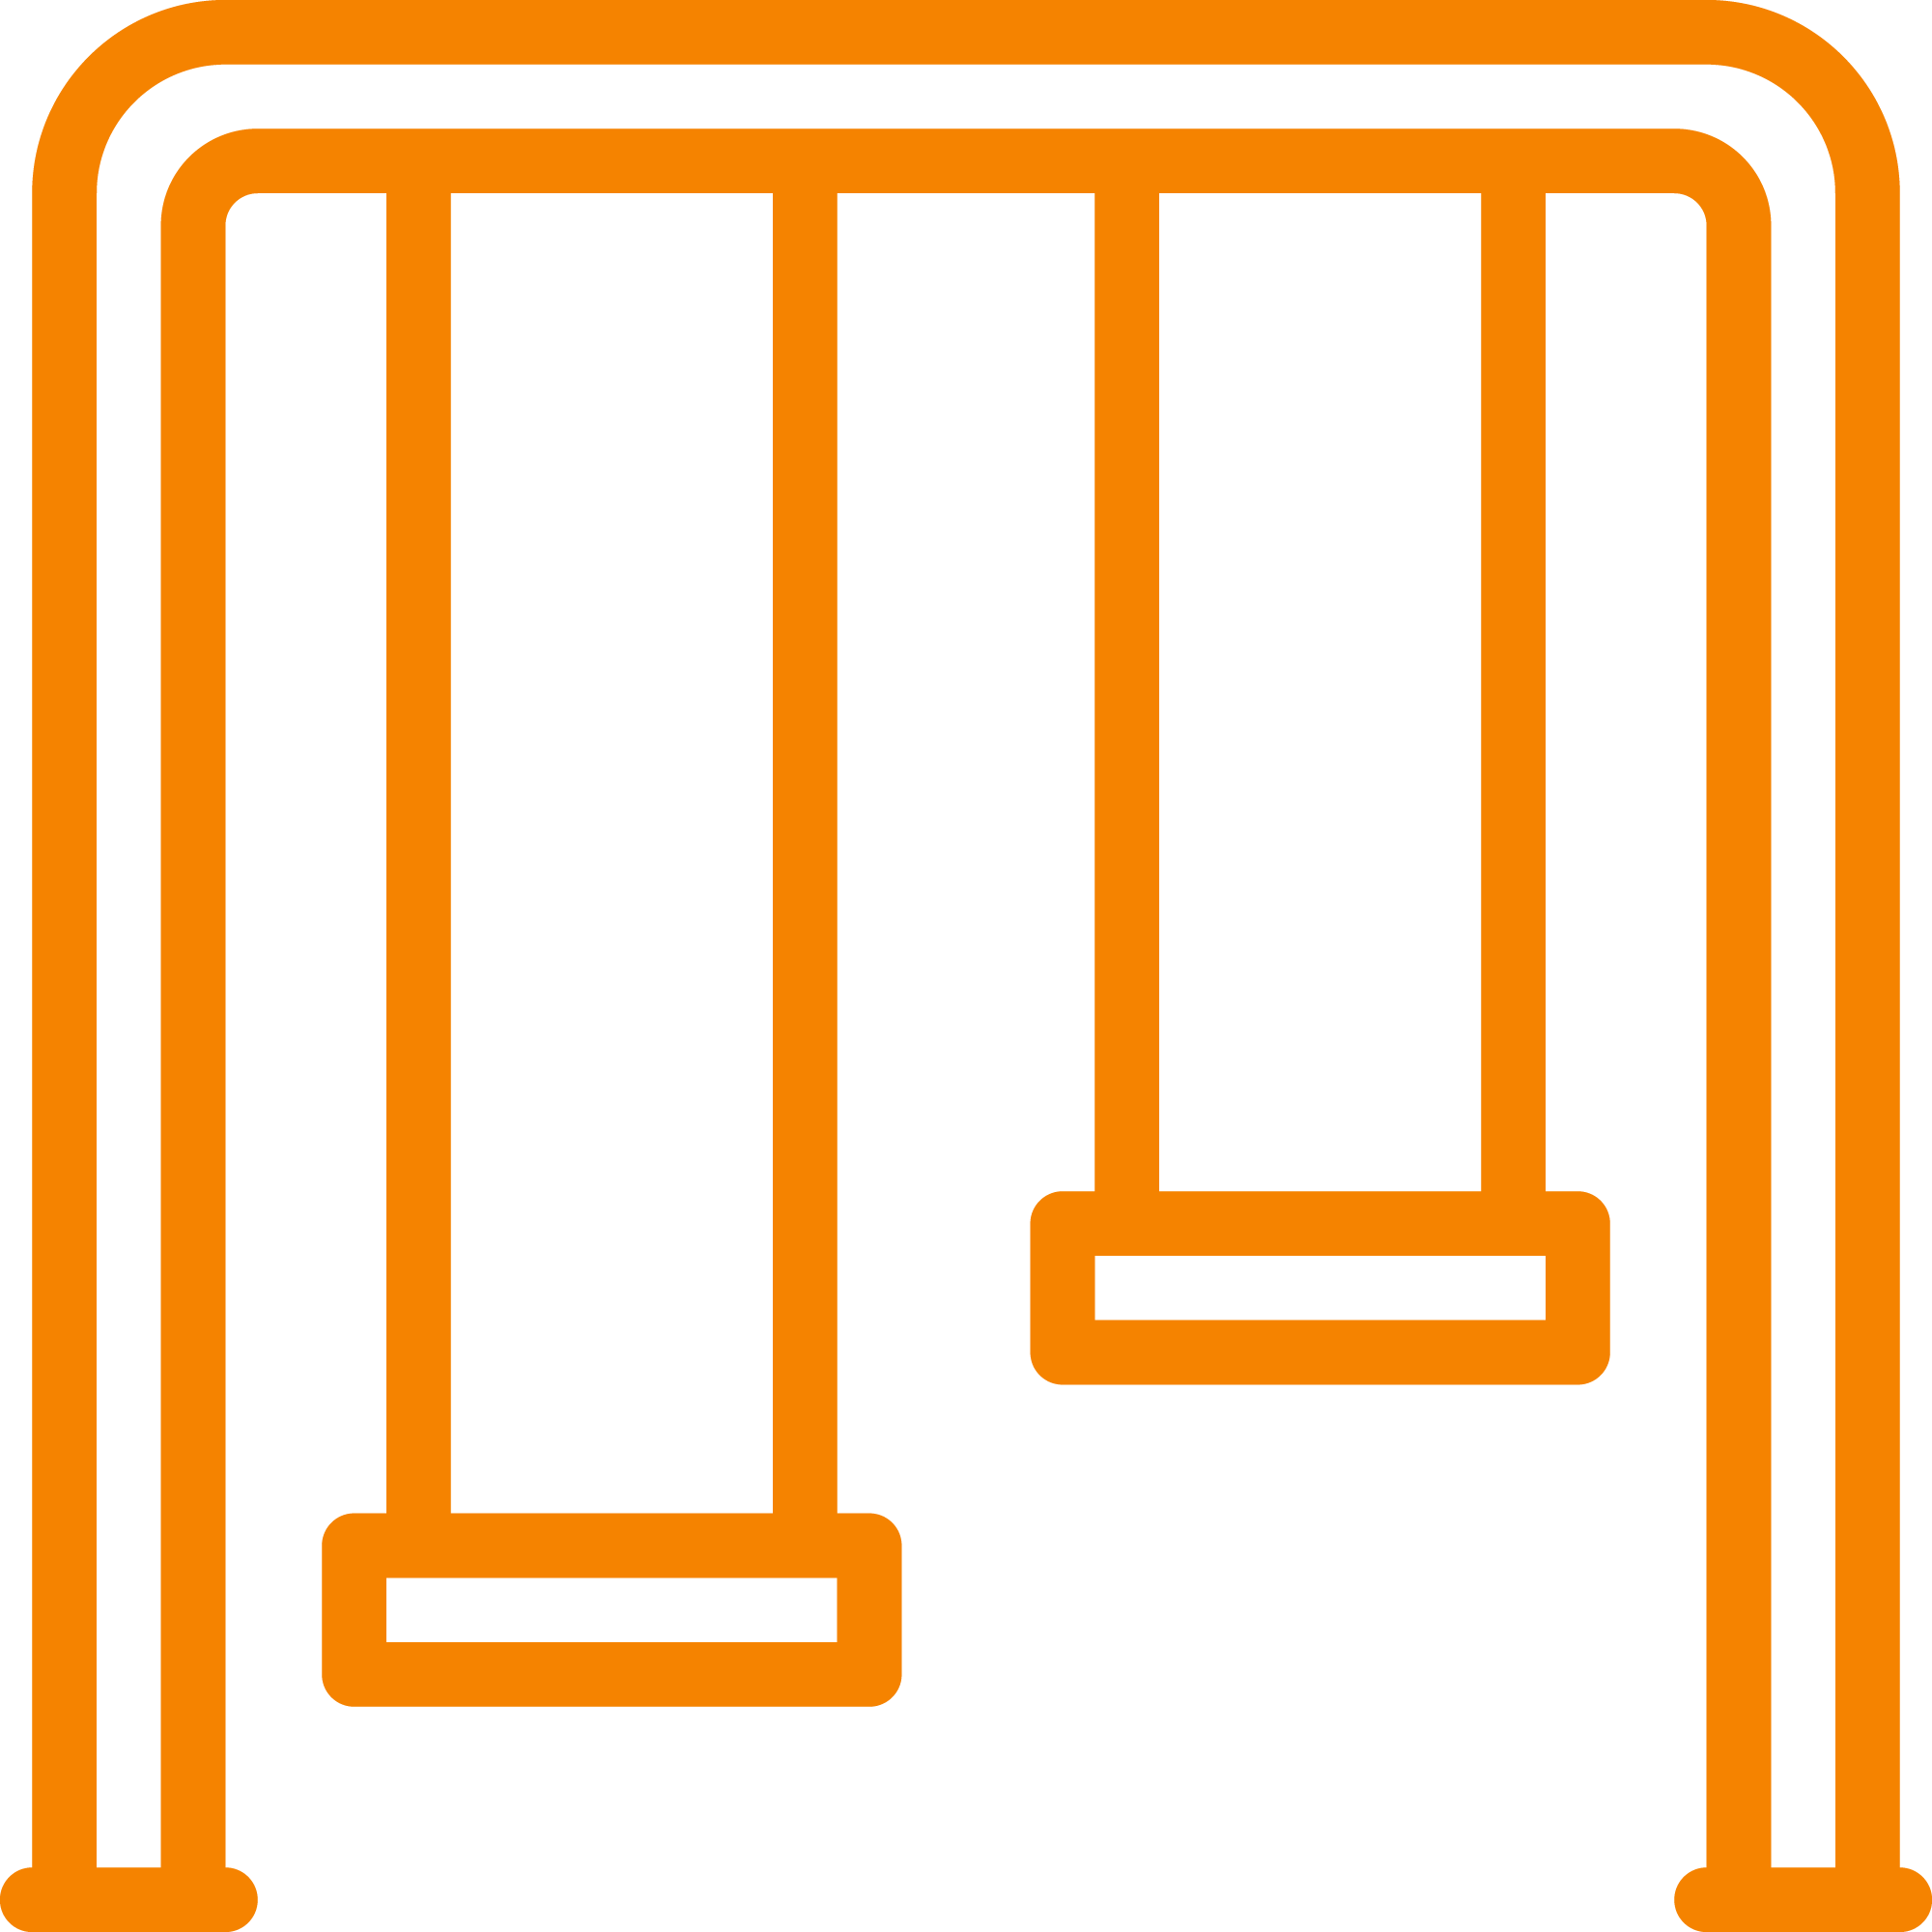 Metal Swingset Icon